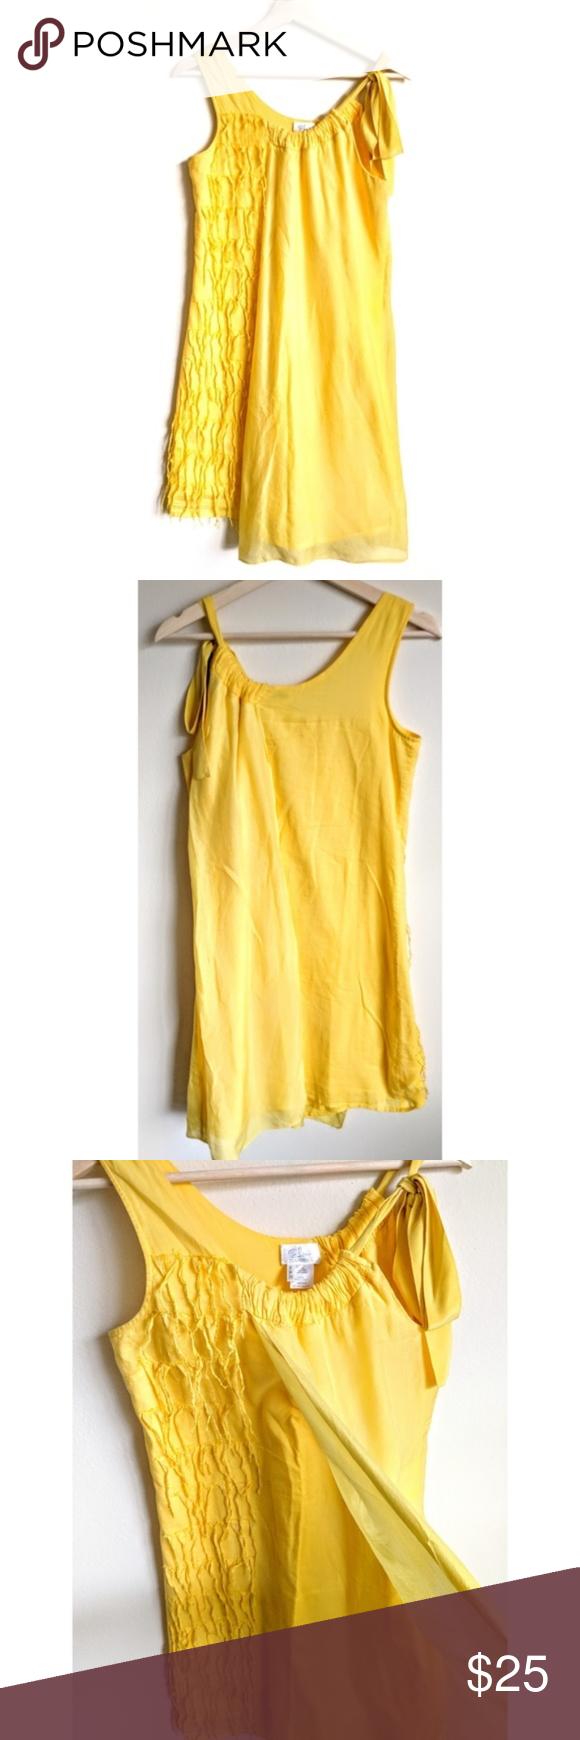 Tony Cohen Yellow Silk Cotton Sun Dress 6 A Lightweight Sunflower Yellow Dress By 2 Love Tony Cohen Half Of The Fron Clothes Design Dresses Cotton Dresses [ 1740 x 580 Pixel ]